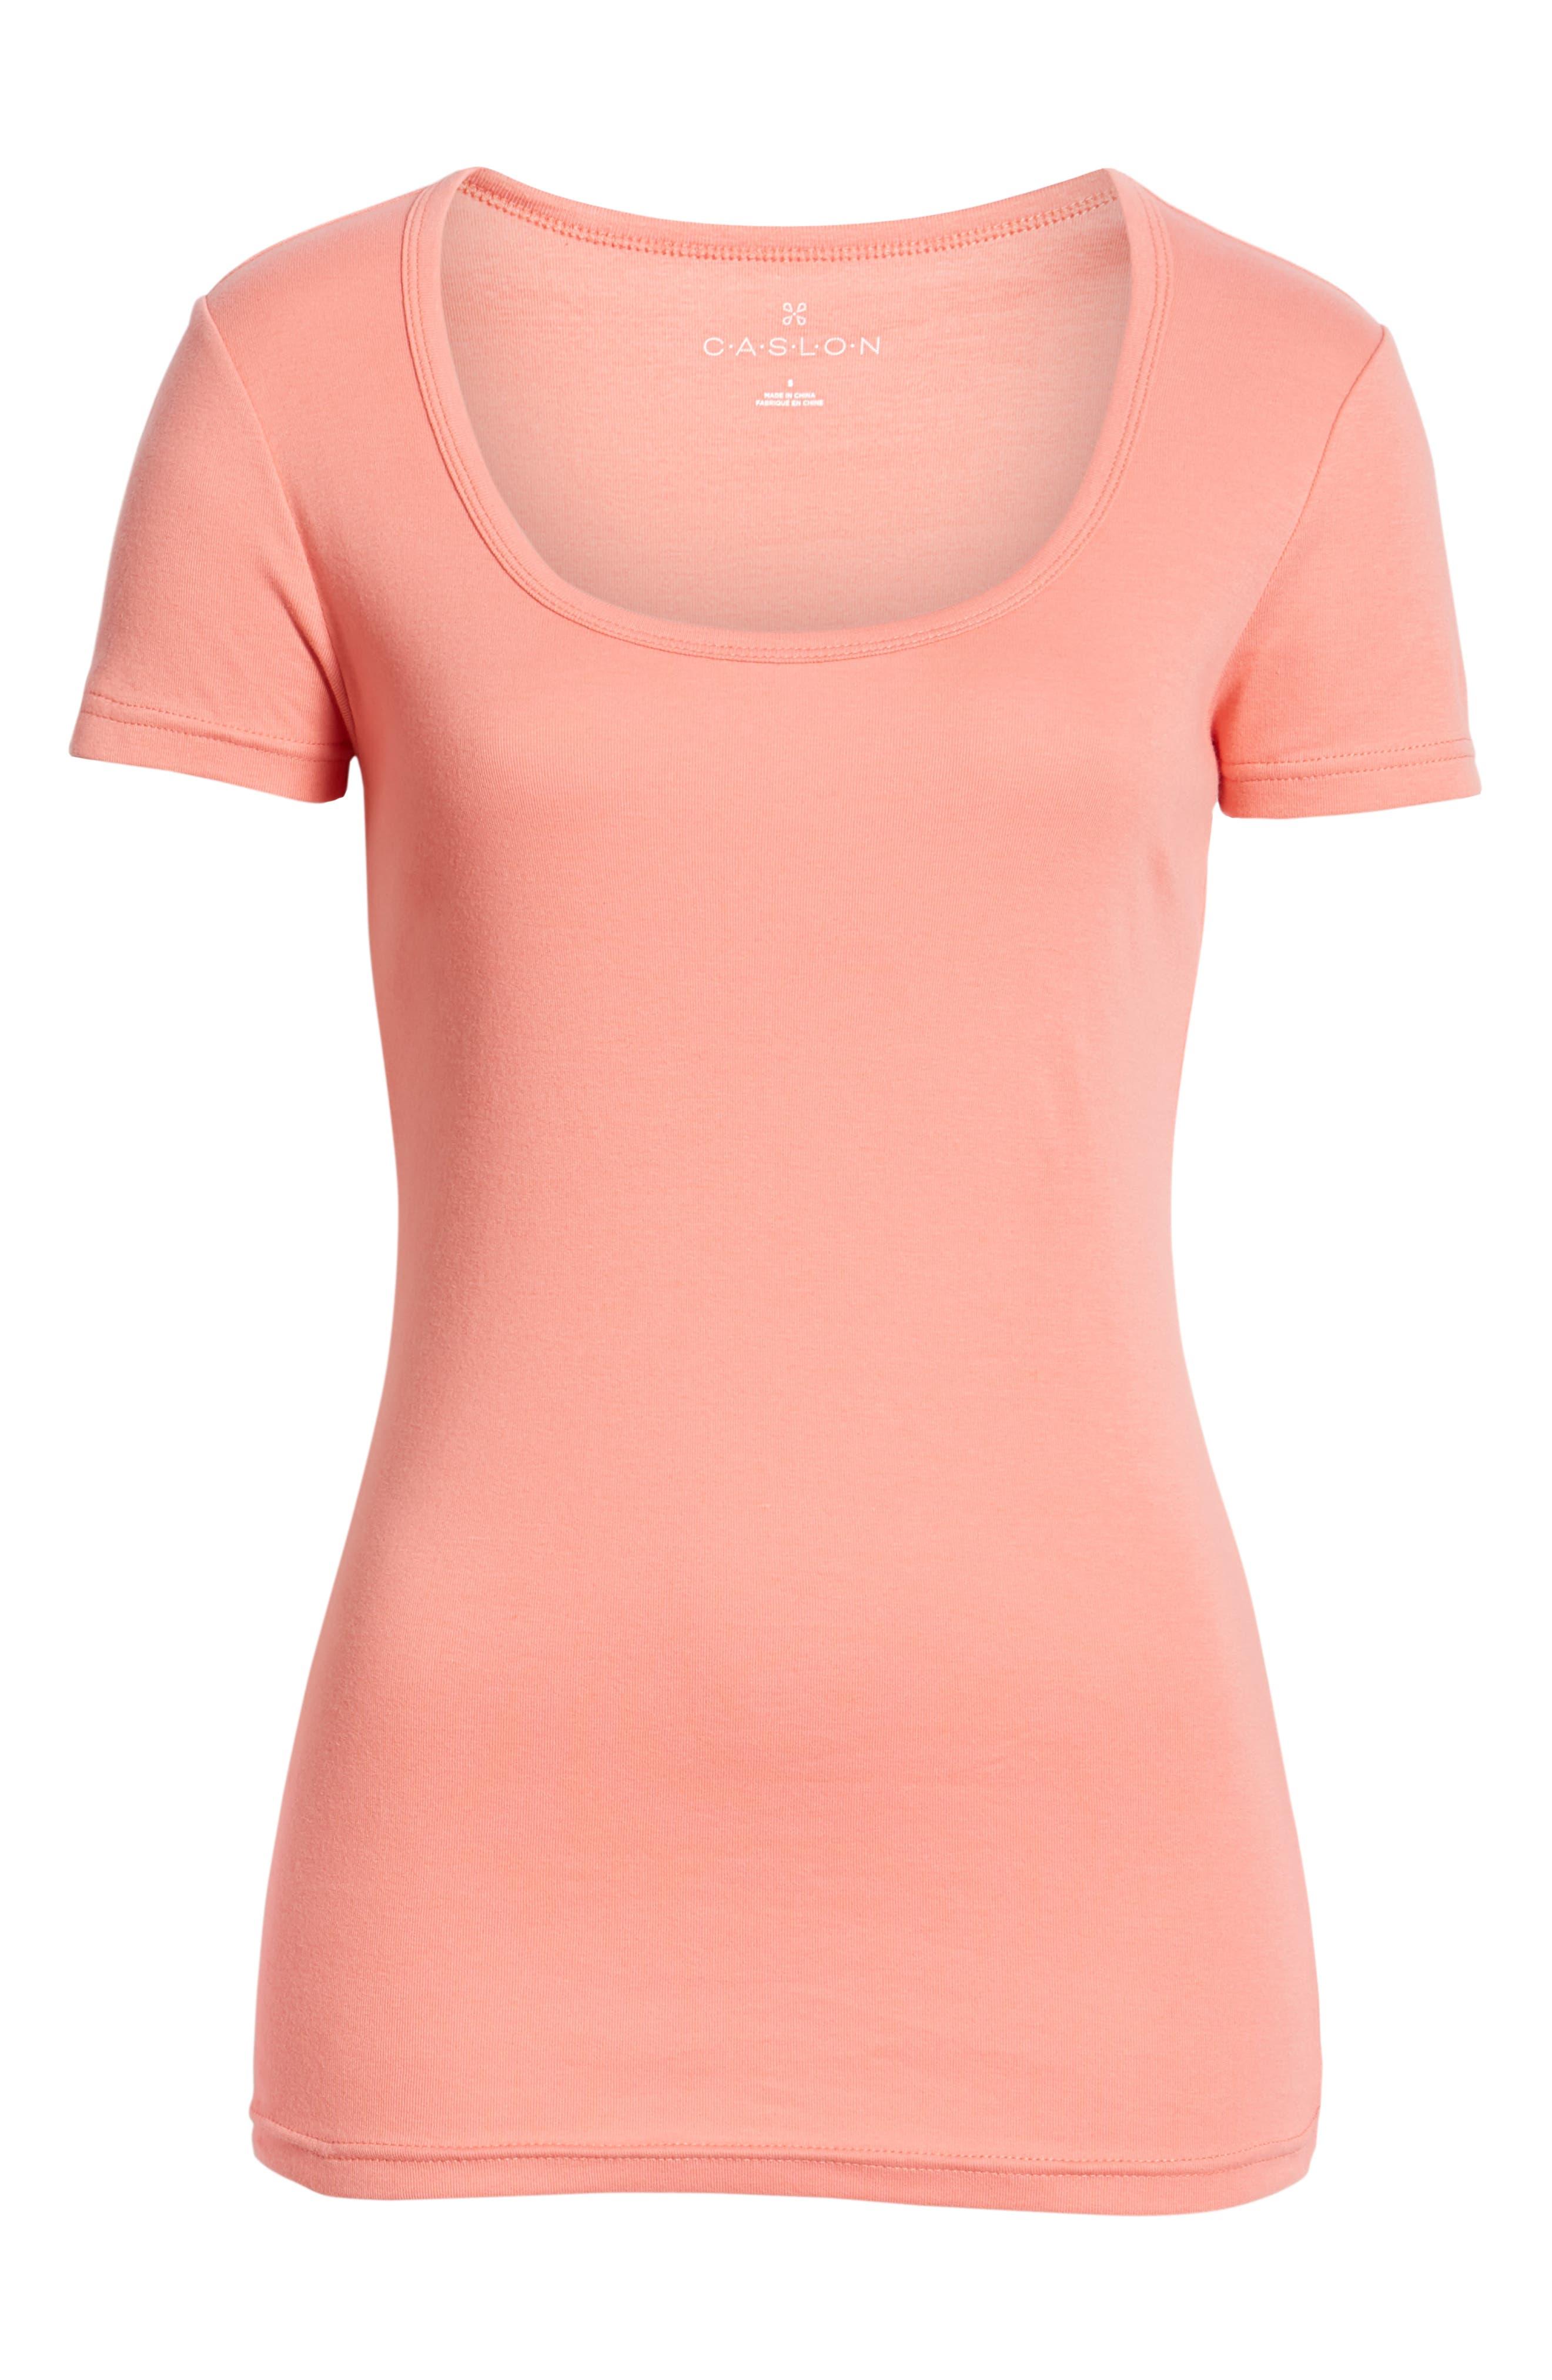 9121d71f39ad7b Women s Orange Tops